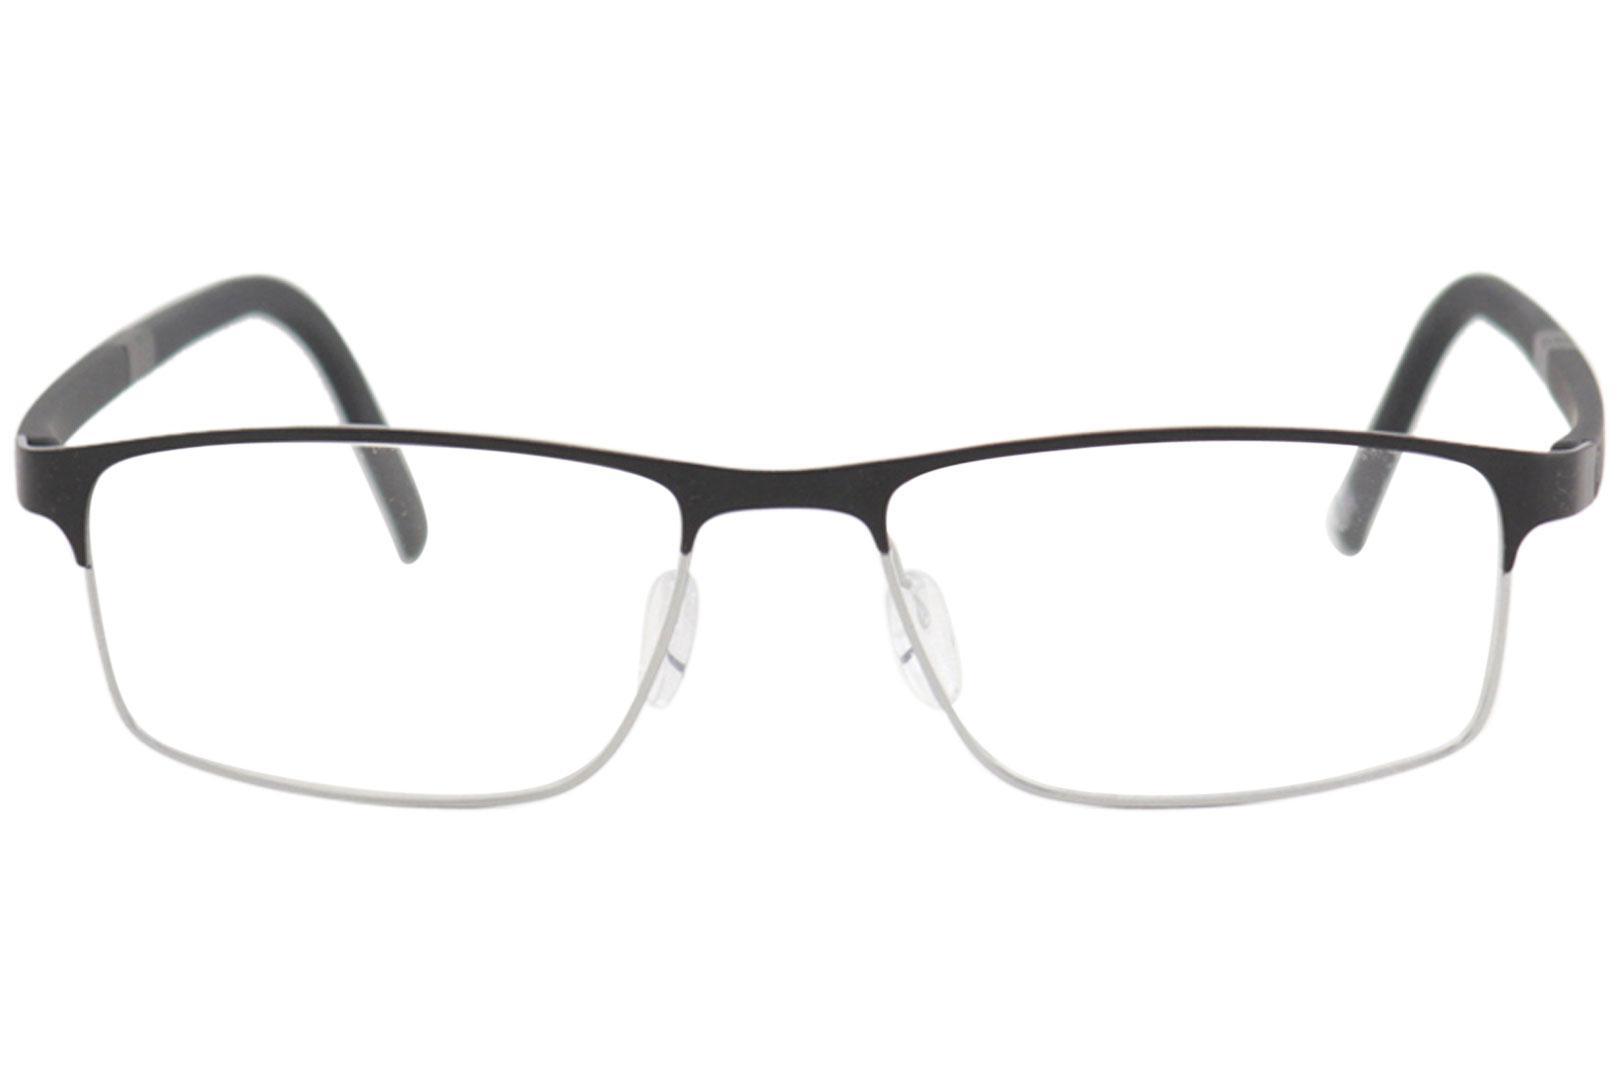 8cf084168a3 Neubau Men s Eyeglasses Ben T004 T 004 Full Rim Optical Frame by Neubau.  12345